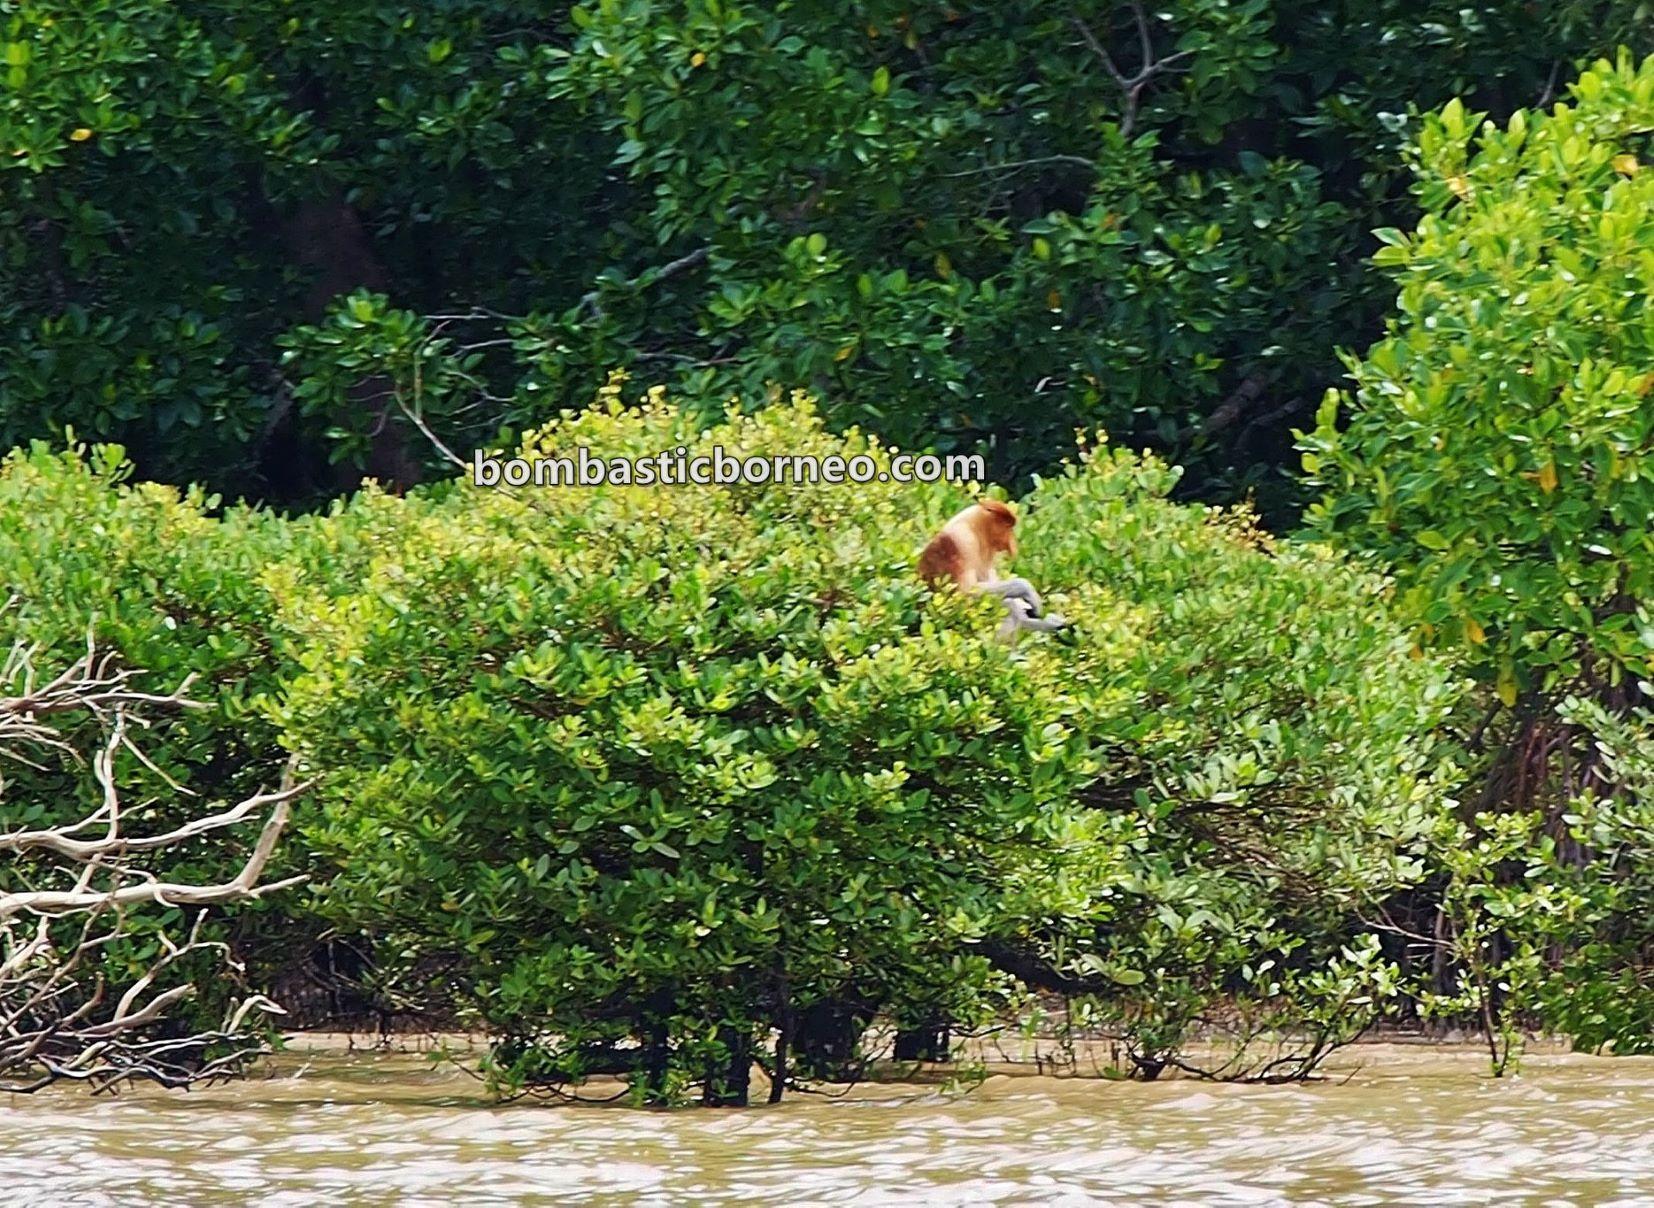 jelajah, adventure, nature, outdoor, backpackers, destination, Malaysia, Nasalis Lavartus, Proboscis monkey, Protected Species, wildlife, tourist attraction, Travel Guide, 穿越婆罗洲游踪, 马来西亚沙巴长鼻猴